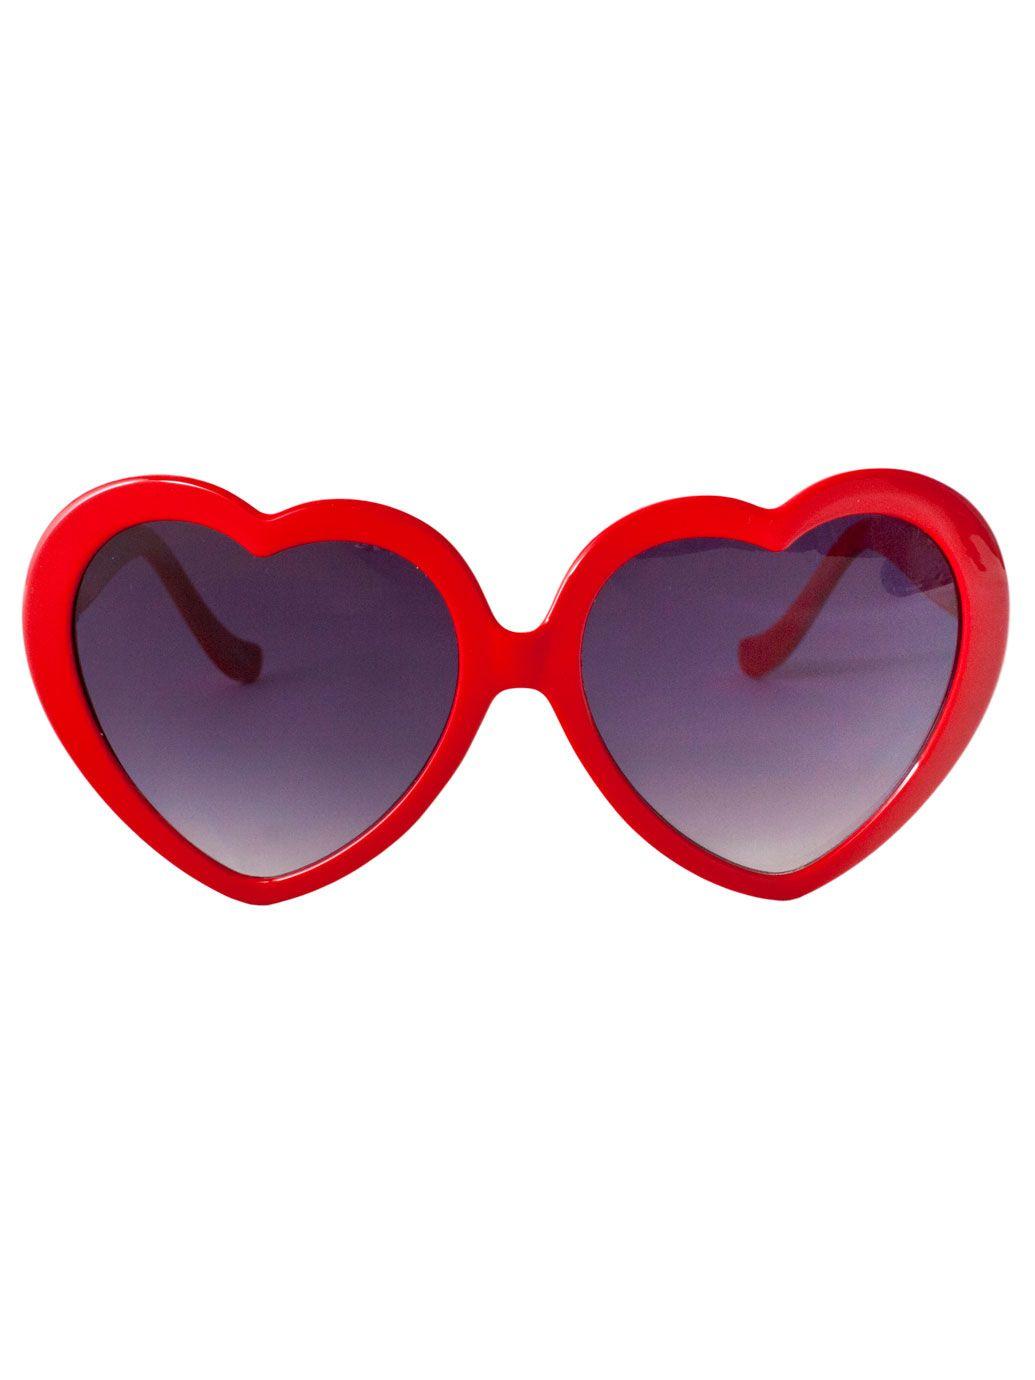 Heart Sunglass | Vintage Eyewear | New & Now's Accessories ...